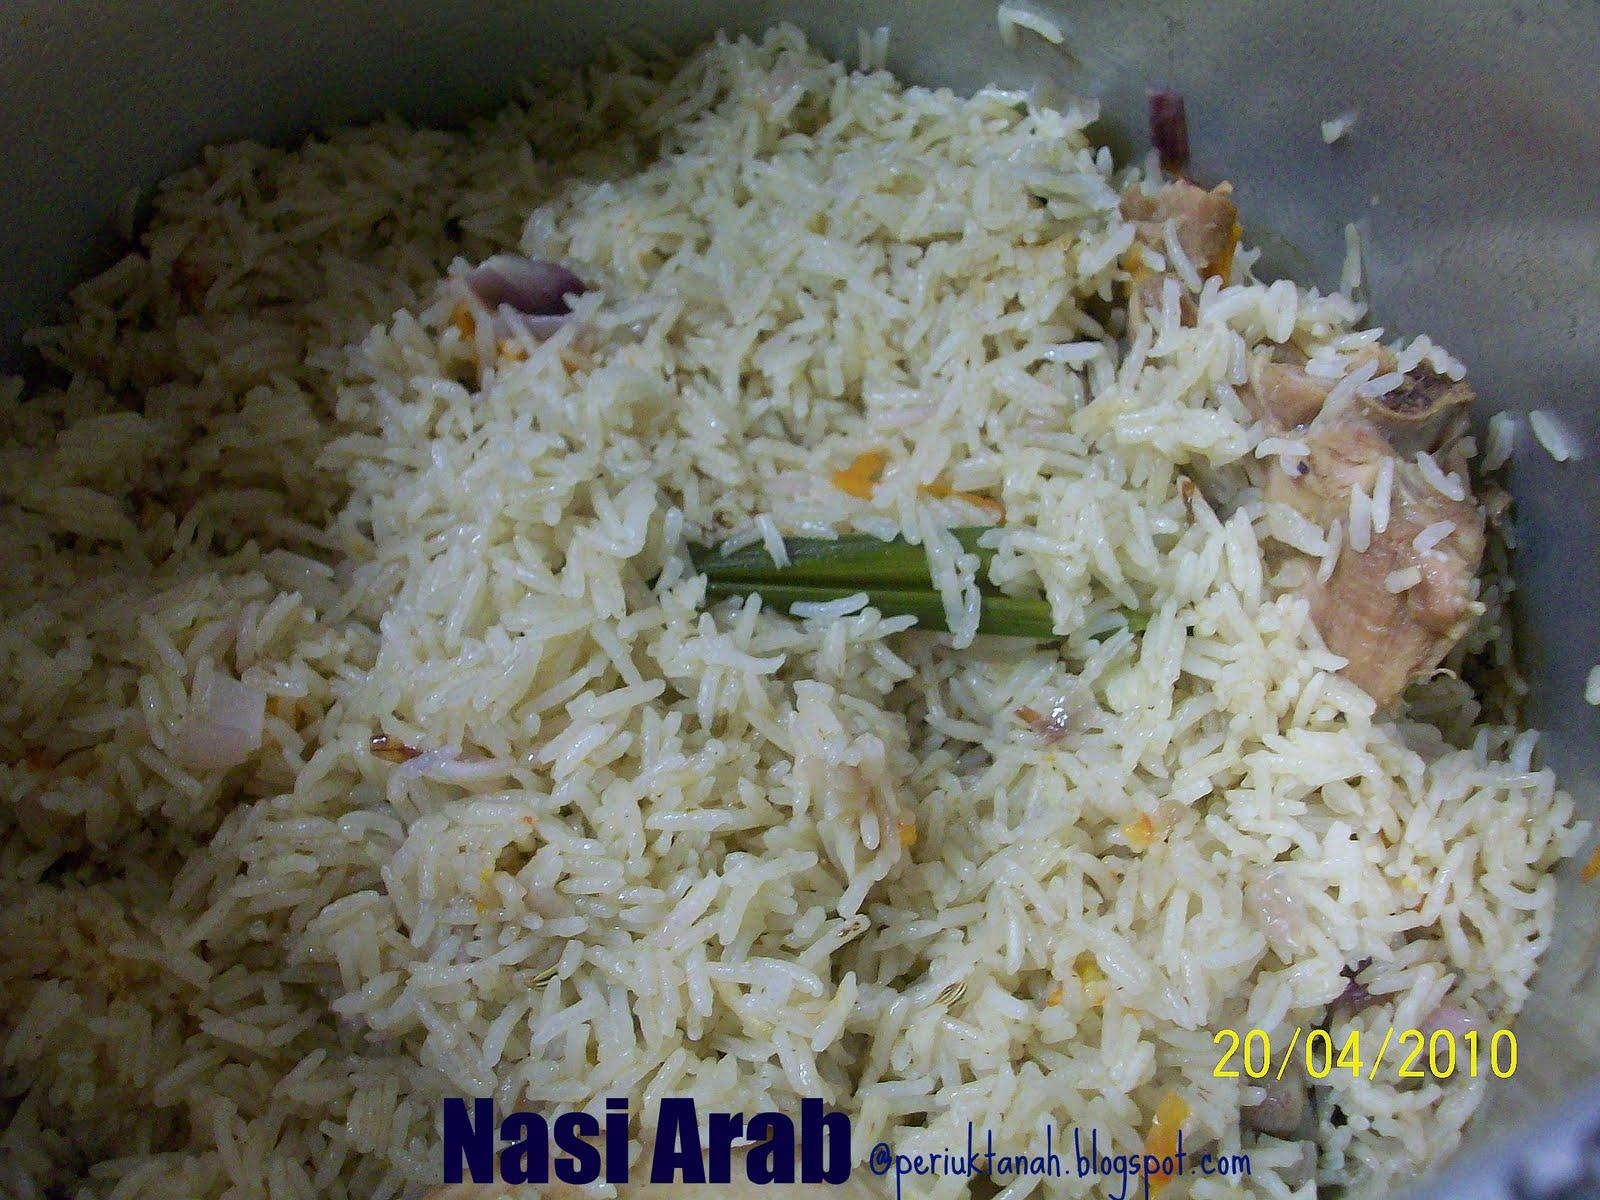 periuktanah: Nasi Arab